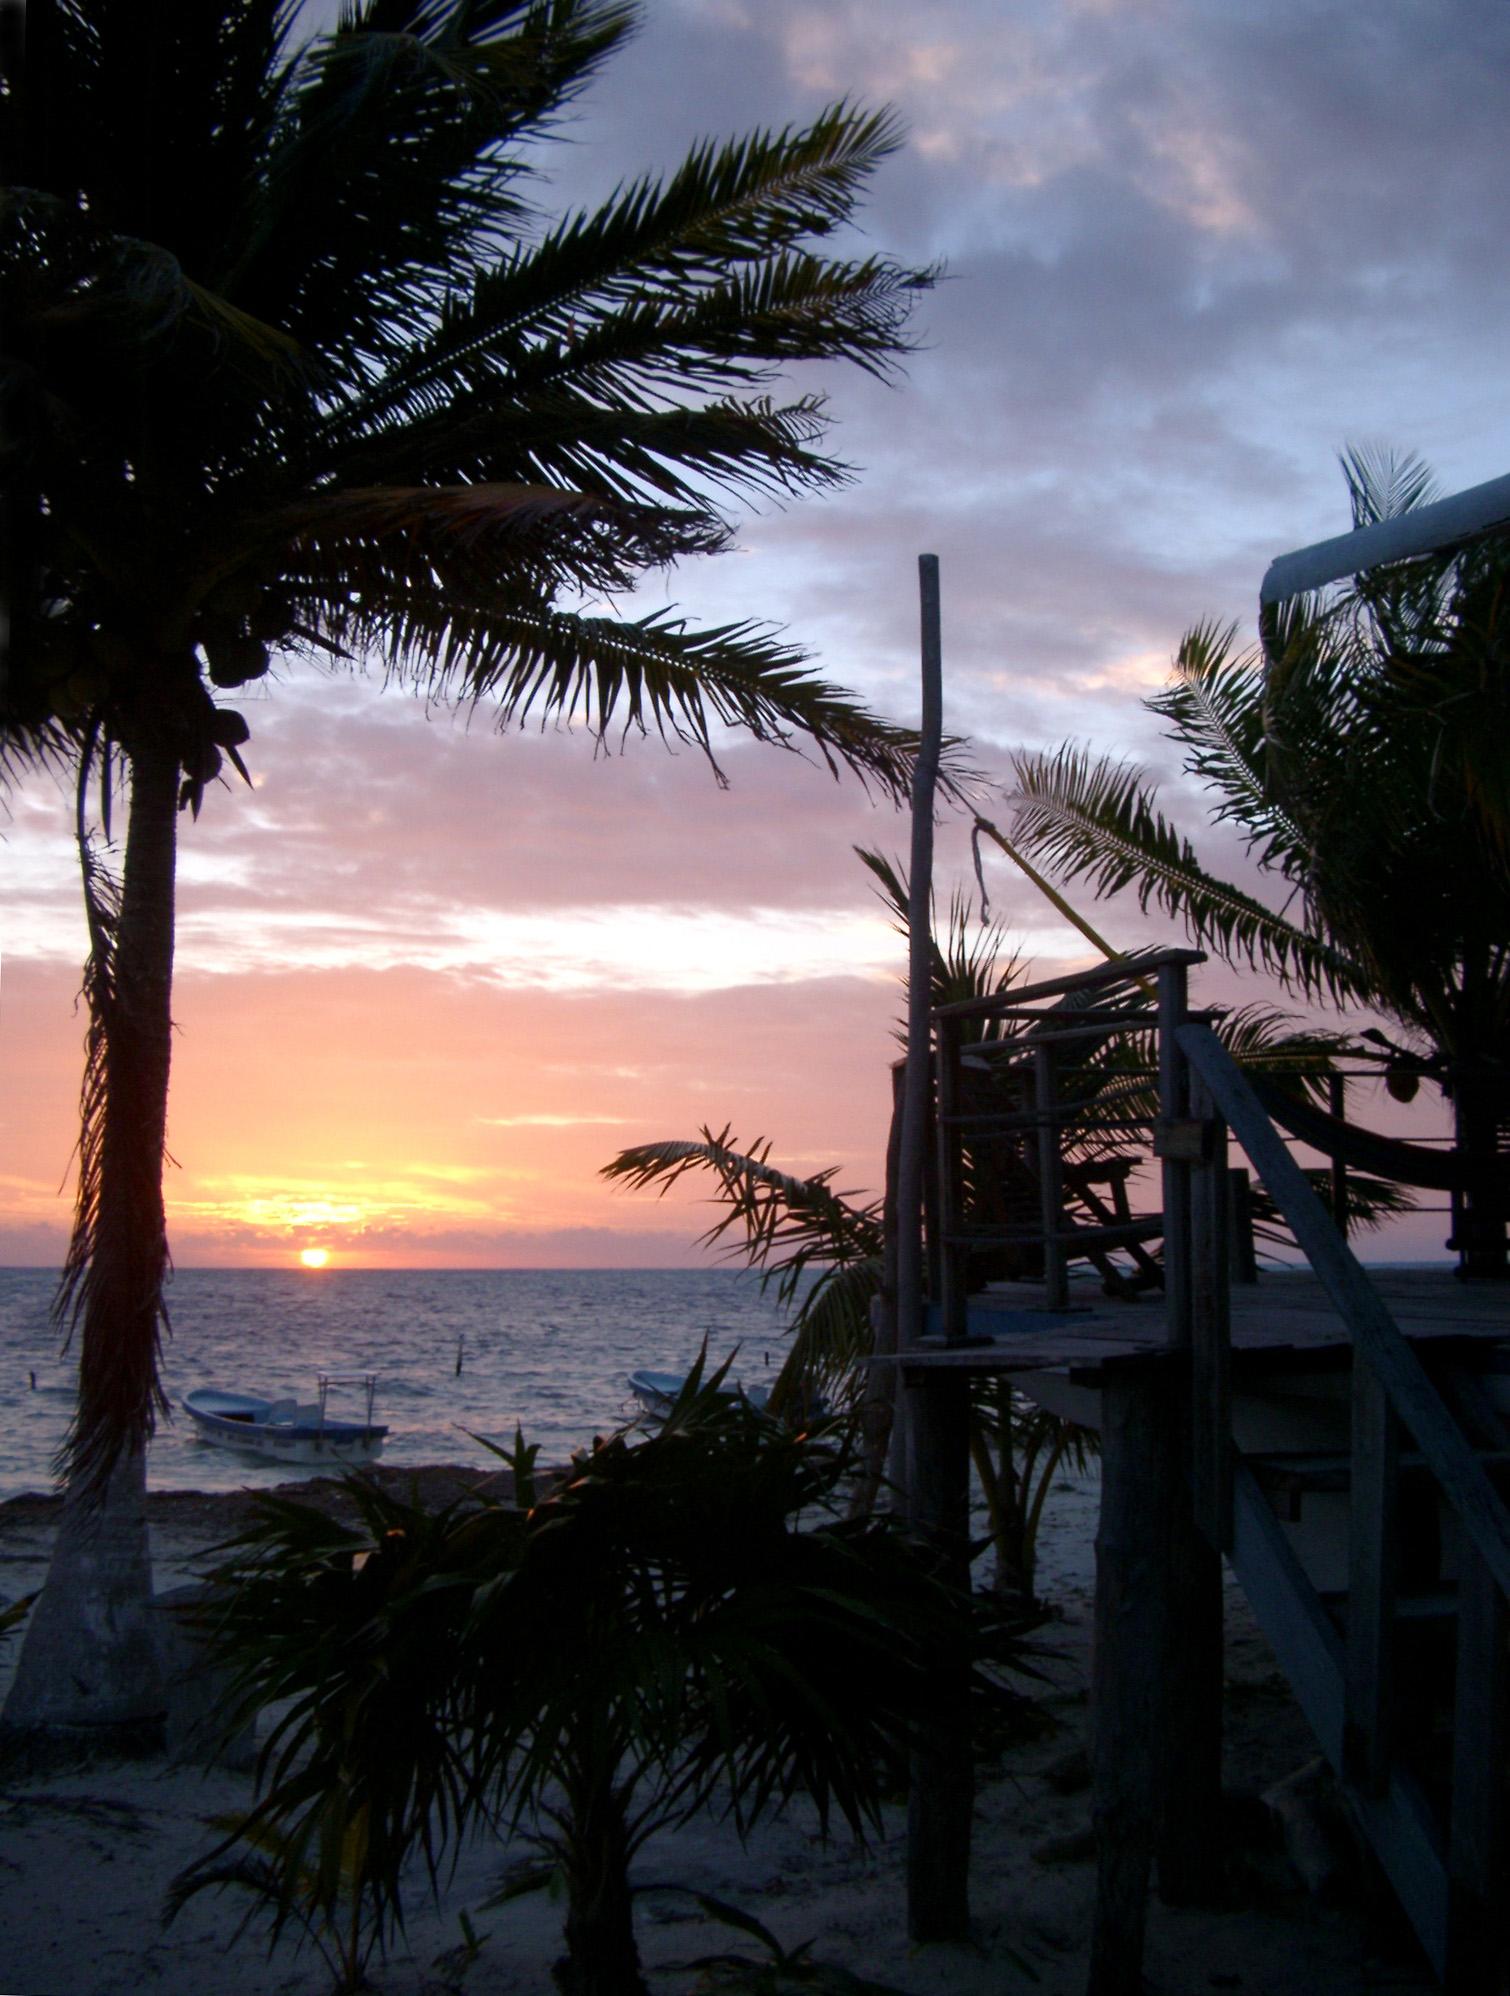 Burning Palm Beach